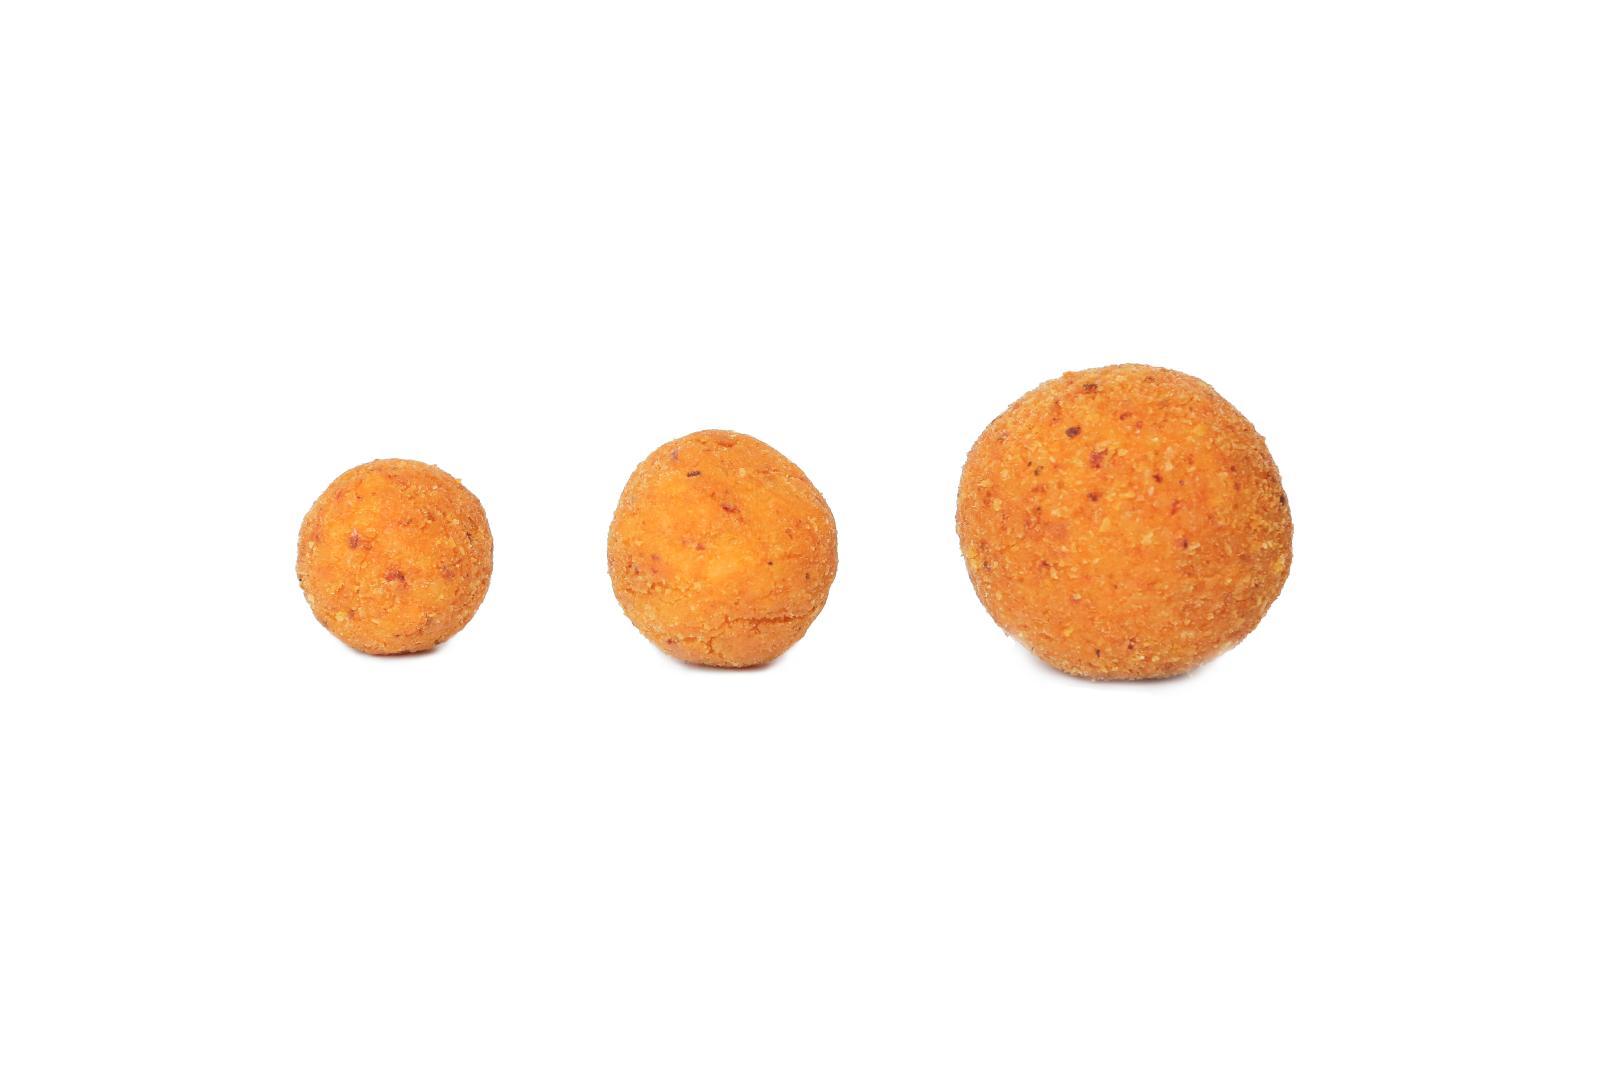 Sito web Food Surgelati Fritti: Surgelgrotte - Maingage, Web Agency Bari